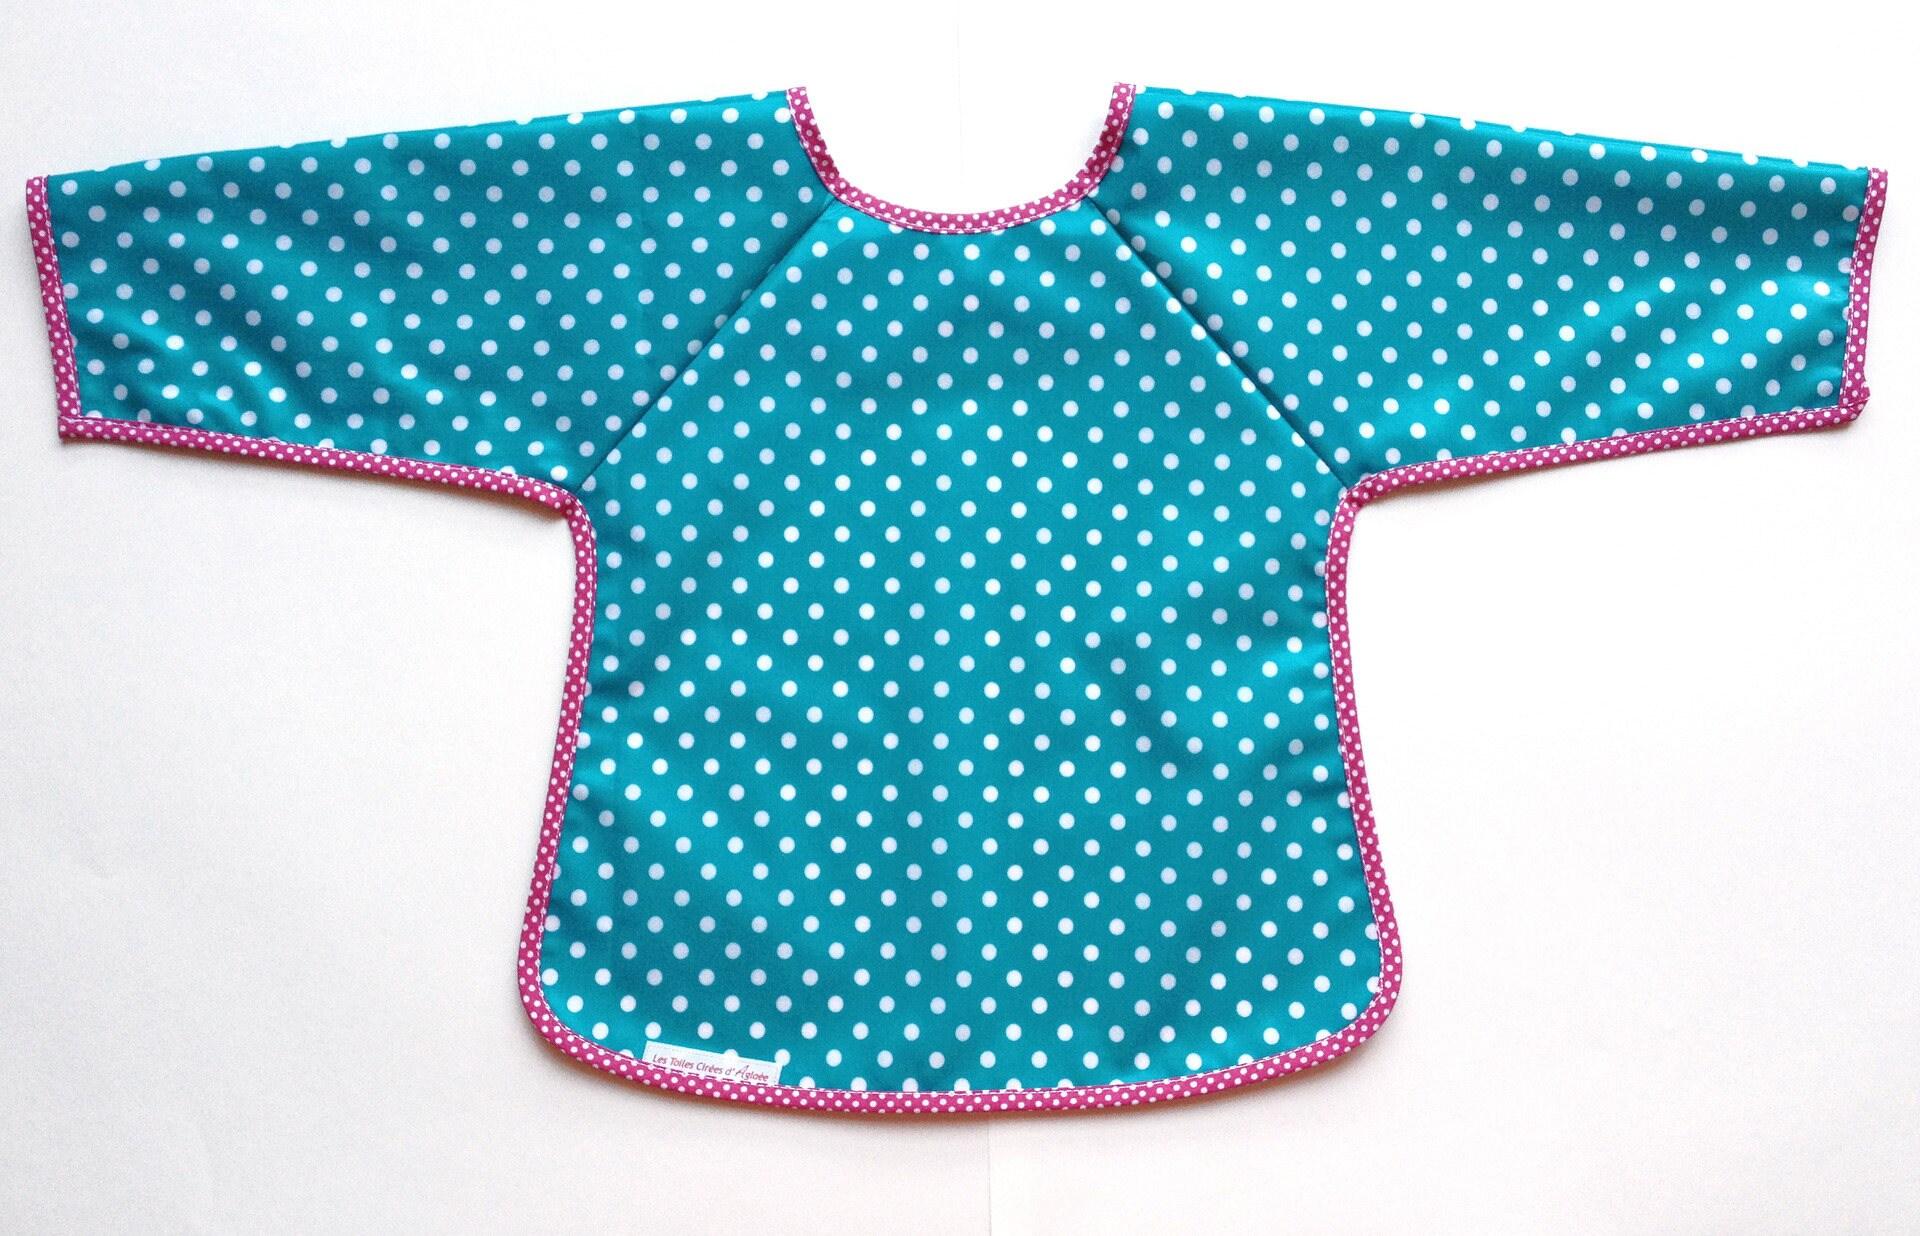 bavoir manches bleu turquoise a pois en tissu enduit enfant. Black Bedroom Furniture Sets. Home Design Ideas